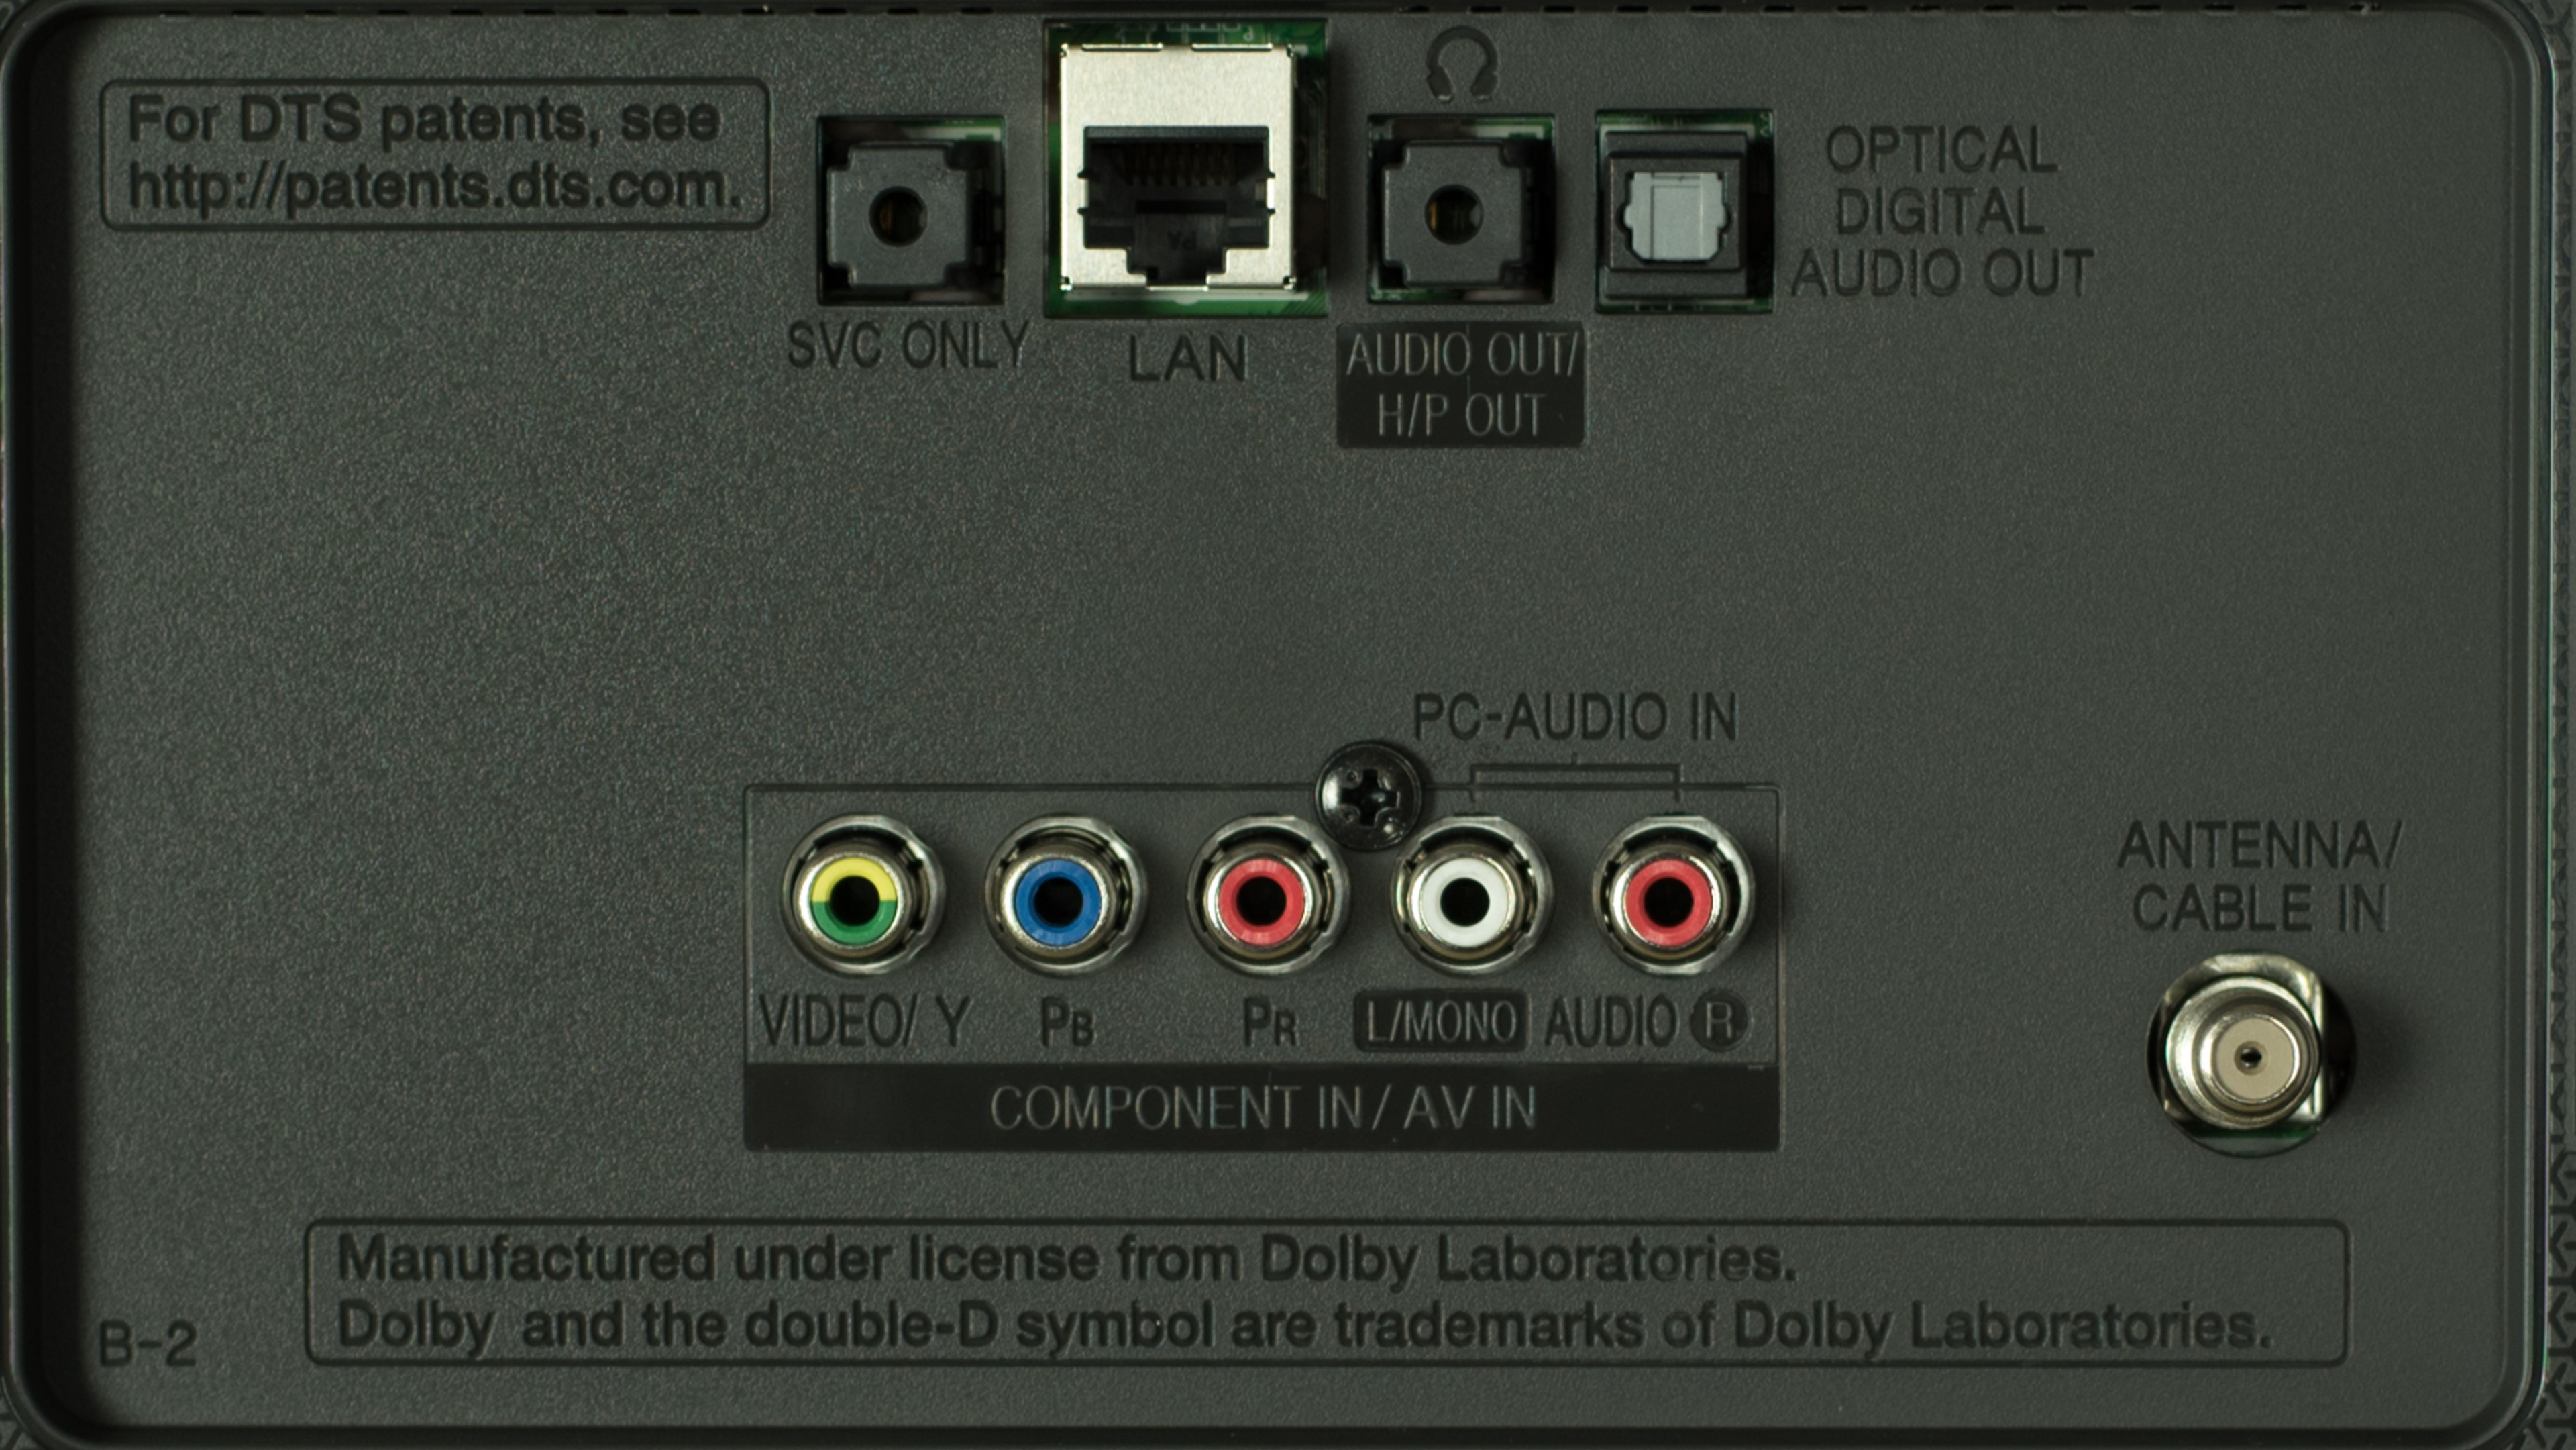 Lg Uf7700 Review 60uf7700 65uf7700 70uf7700 79uf7700